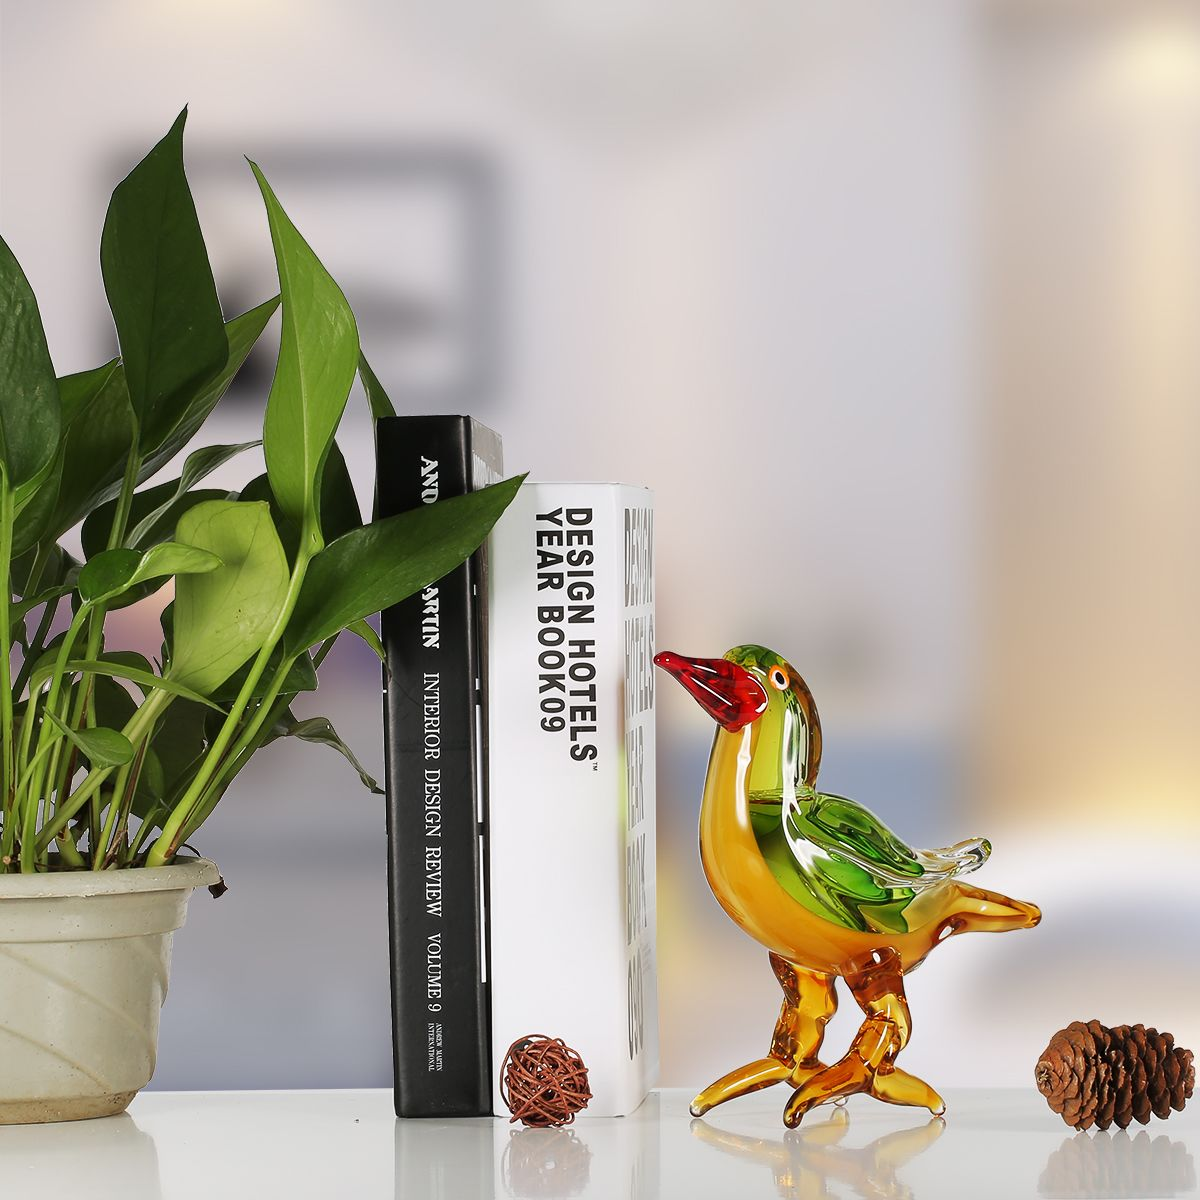 Tooarts Red Beak Bird Glass Sculpture Home Decor Animal Ornament Gift Craft  Decoration